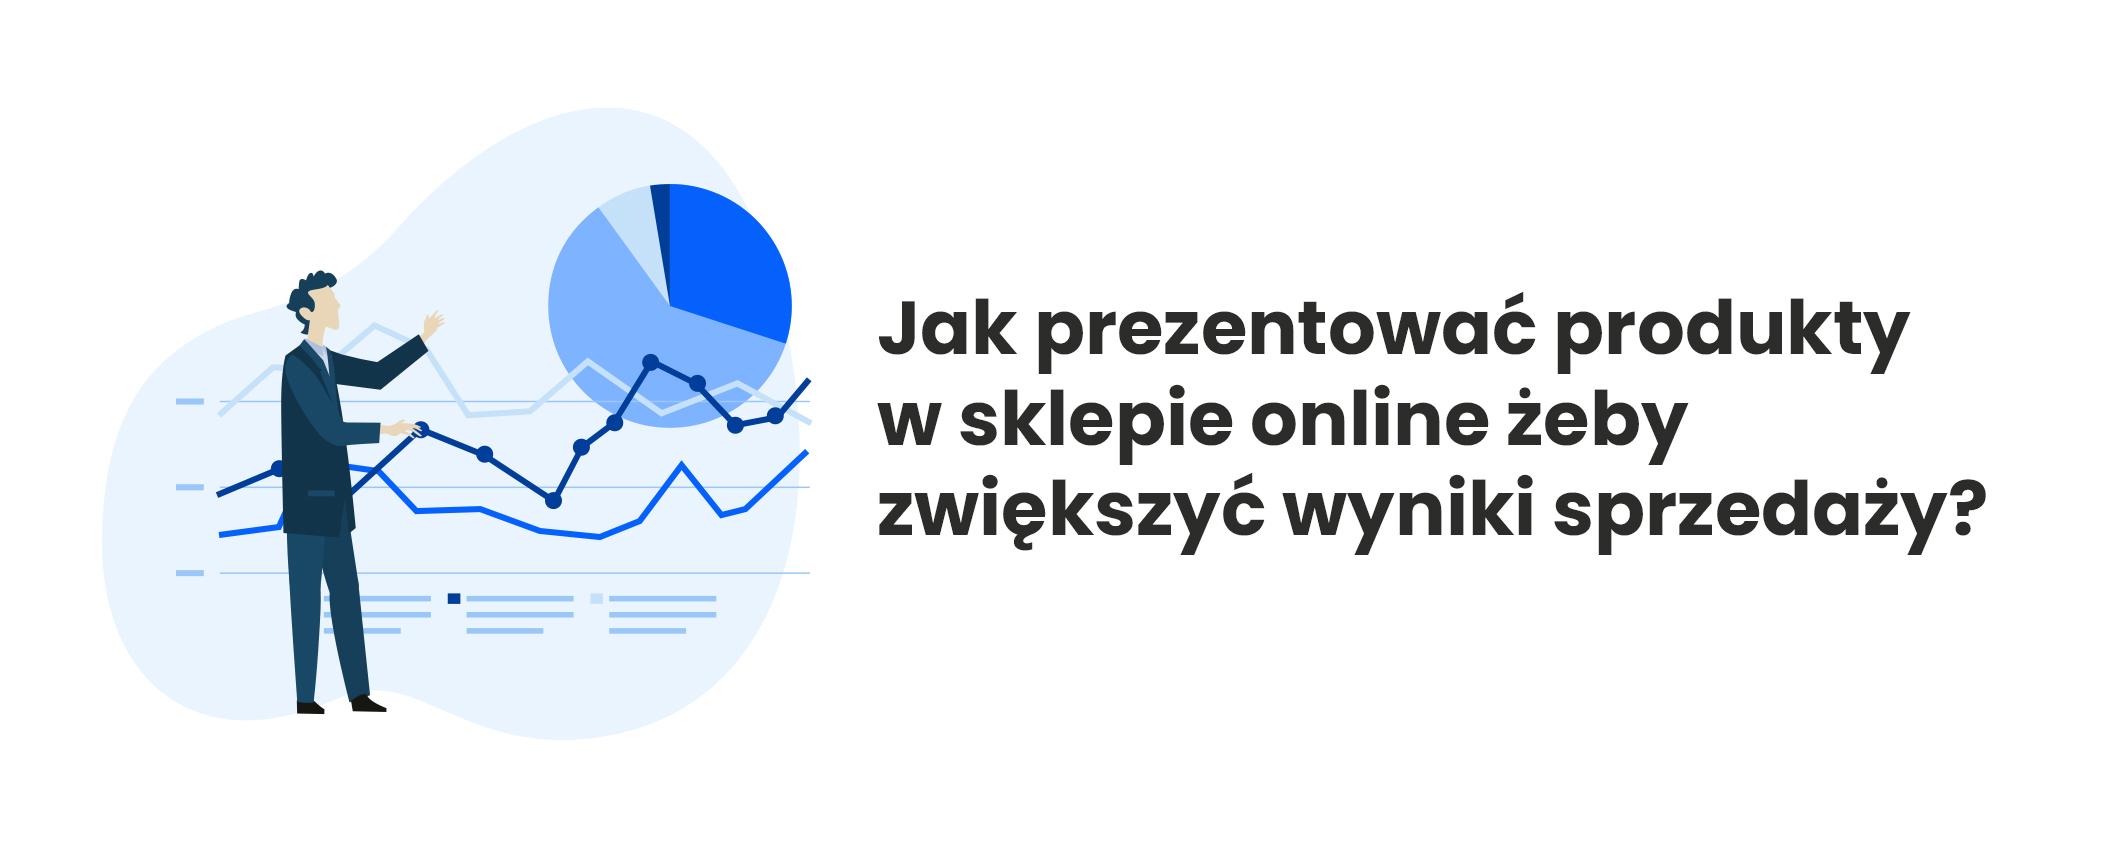 sklepie online